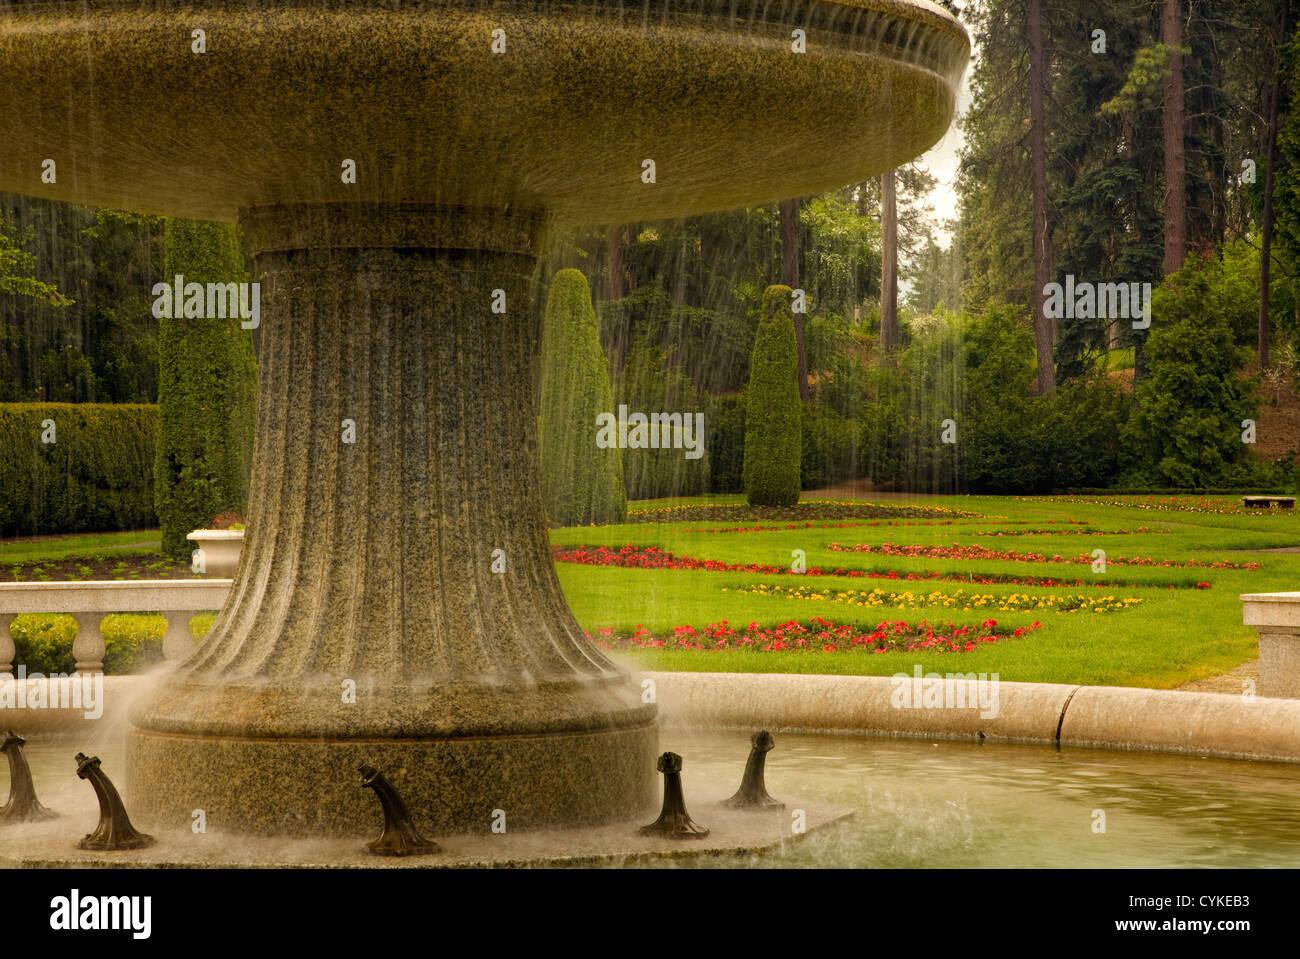 The Fountain In The Formal Garden Stock Photos & The Fountain In The ...